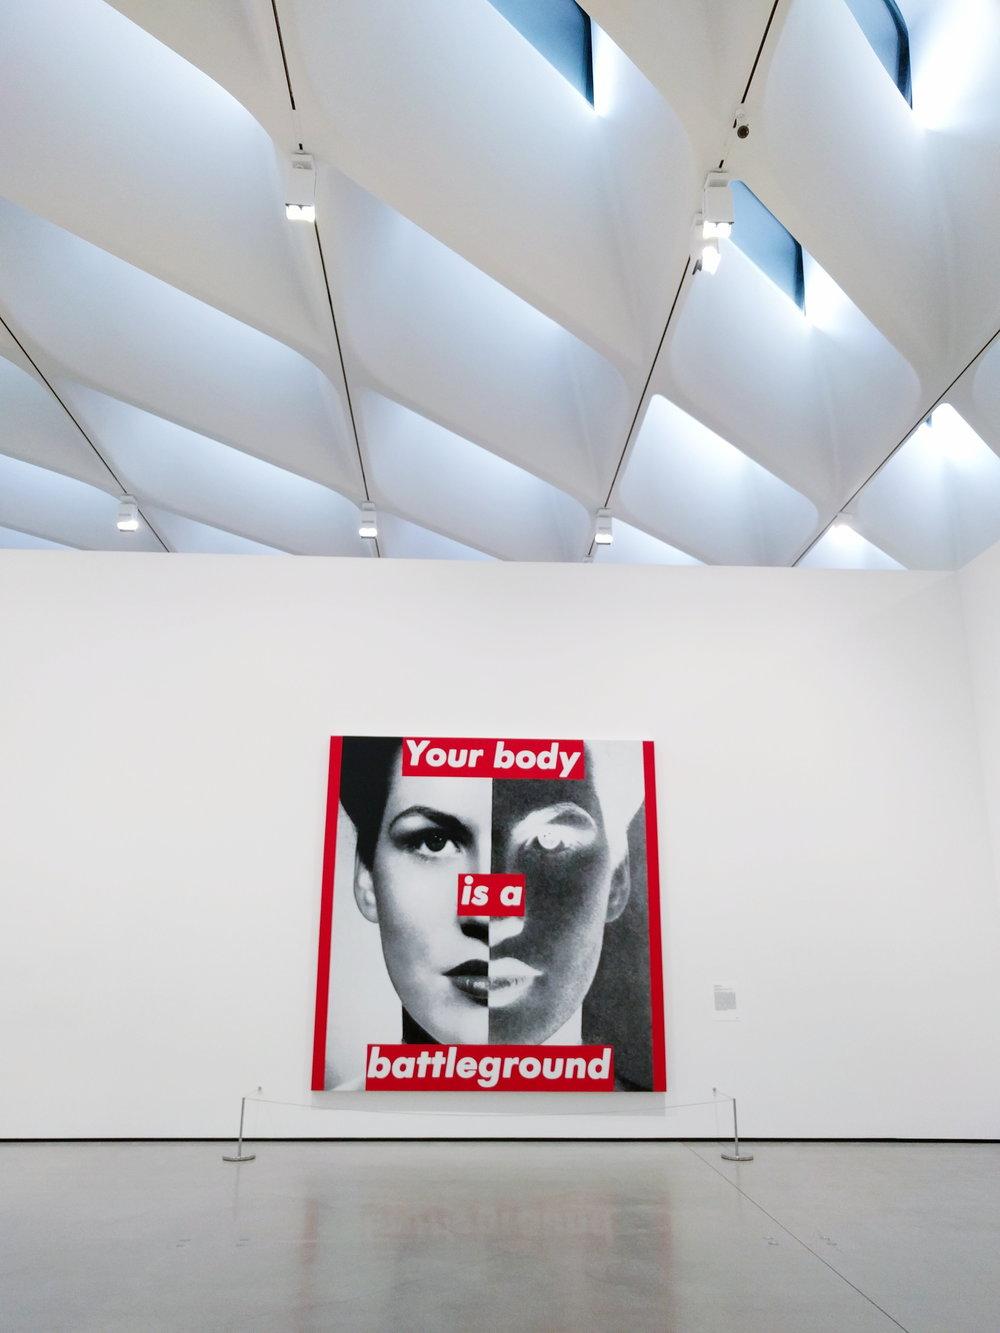 your-body-battleground-art-Barbara-Kruger-the-broad-dtla